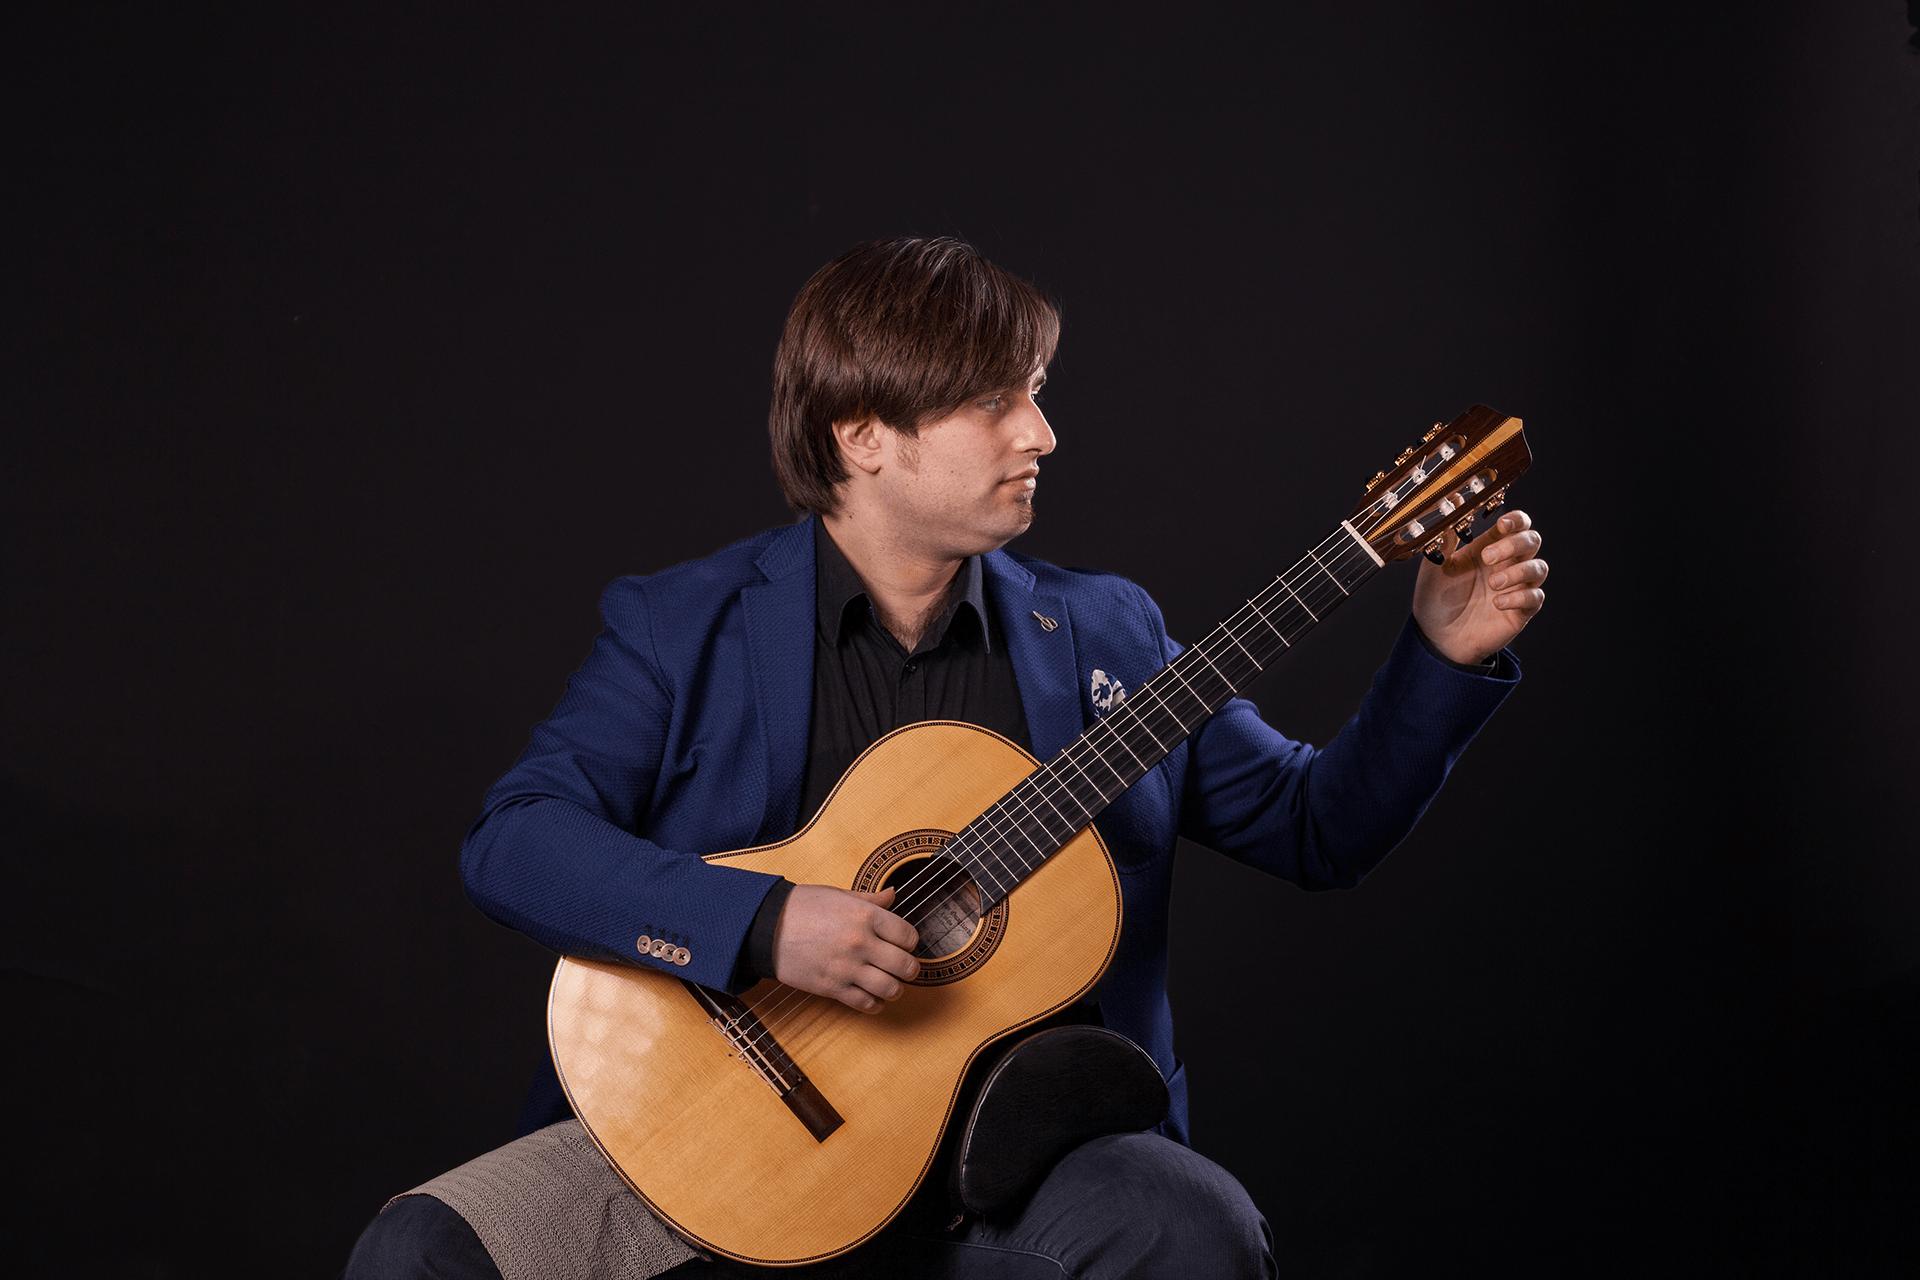 marcello-de-carolis-chitarrista-11